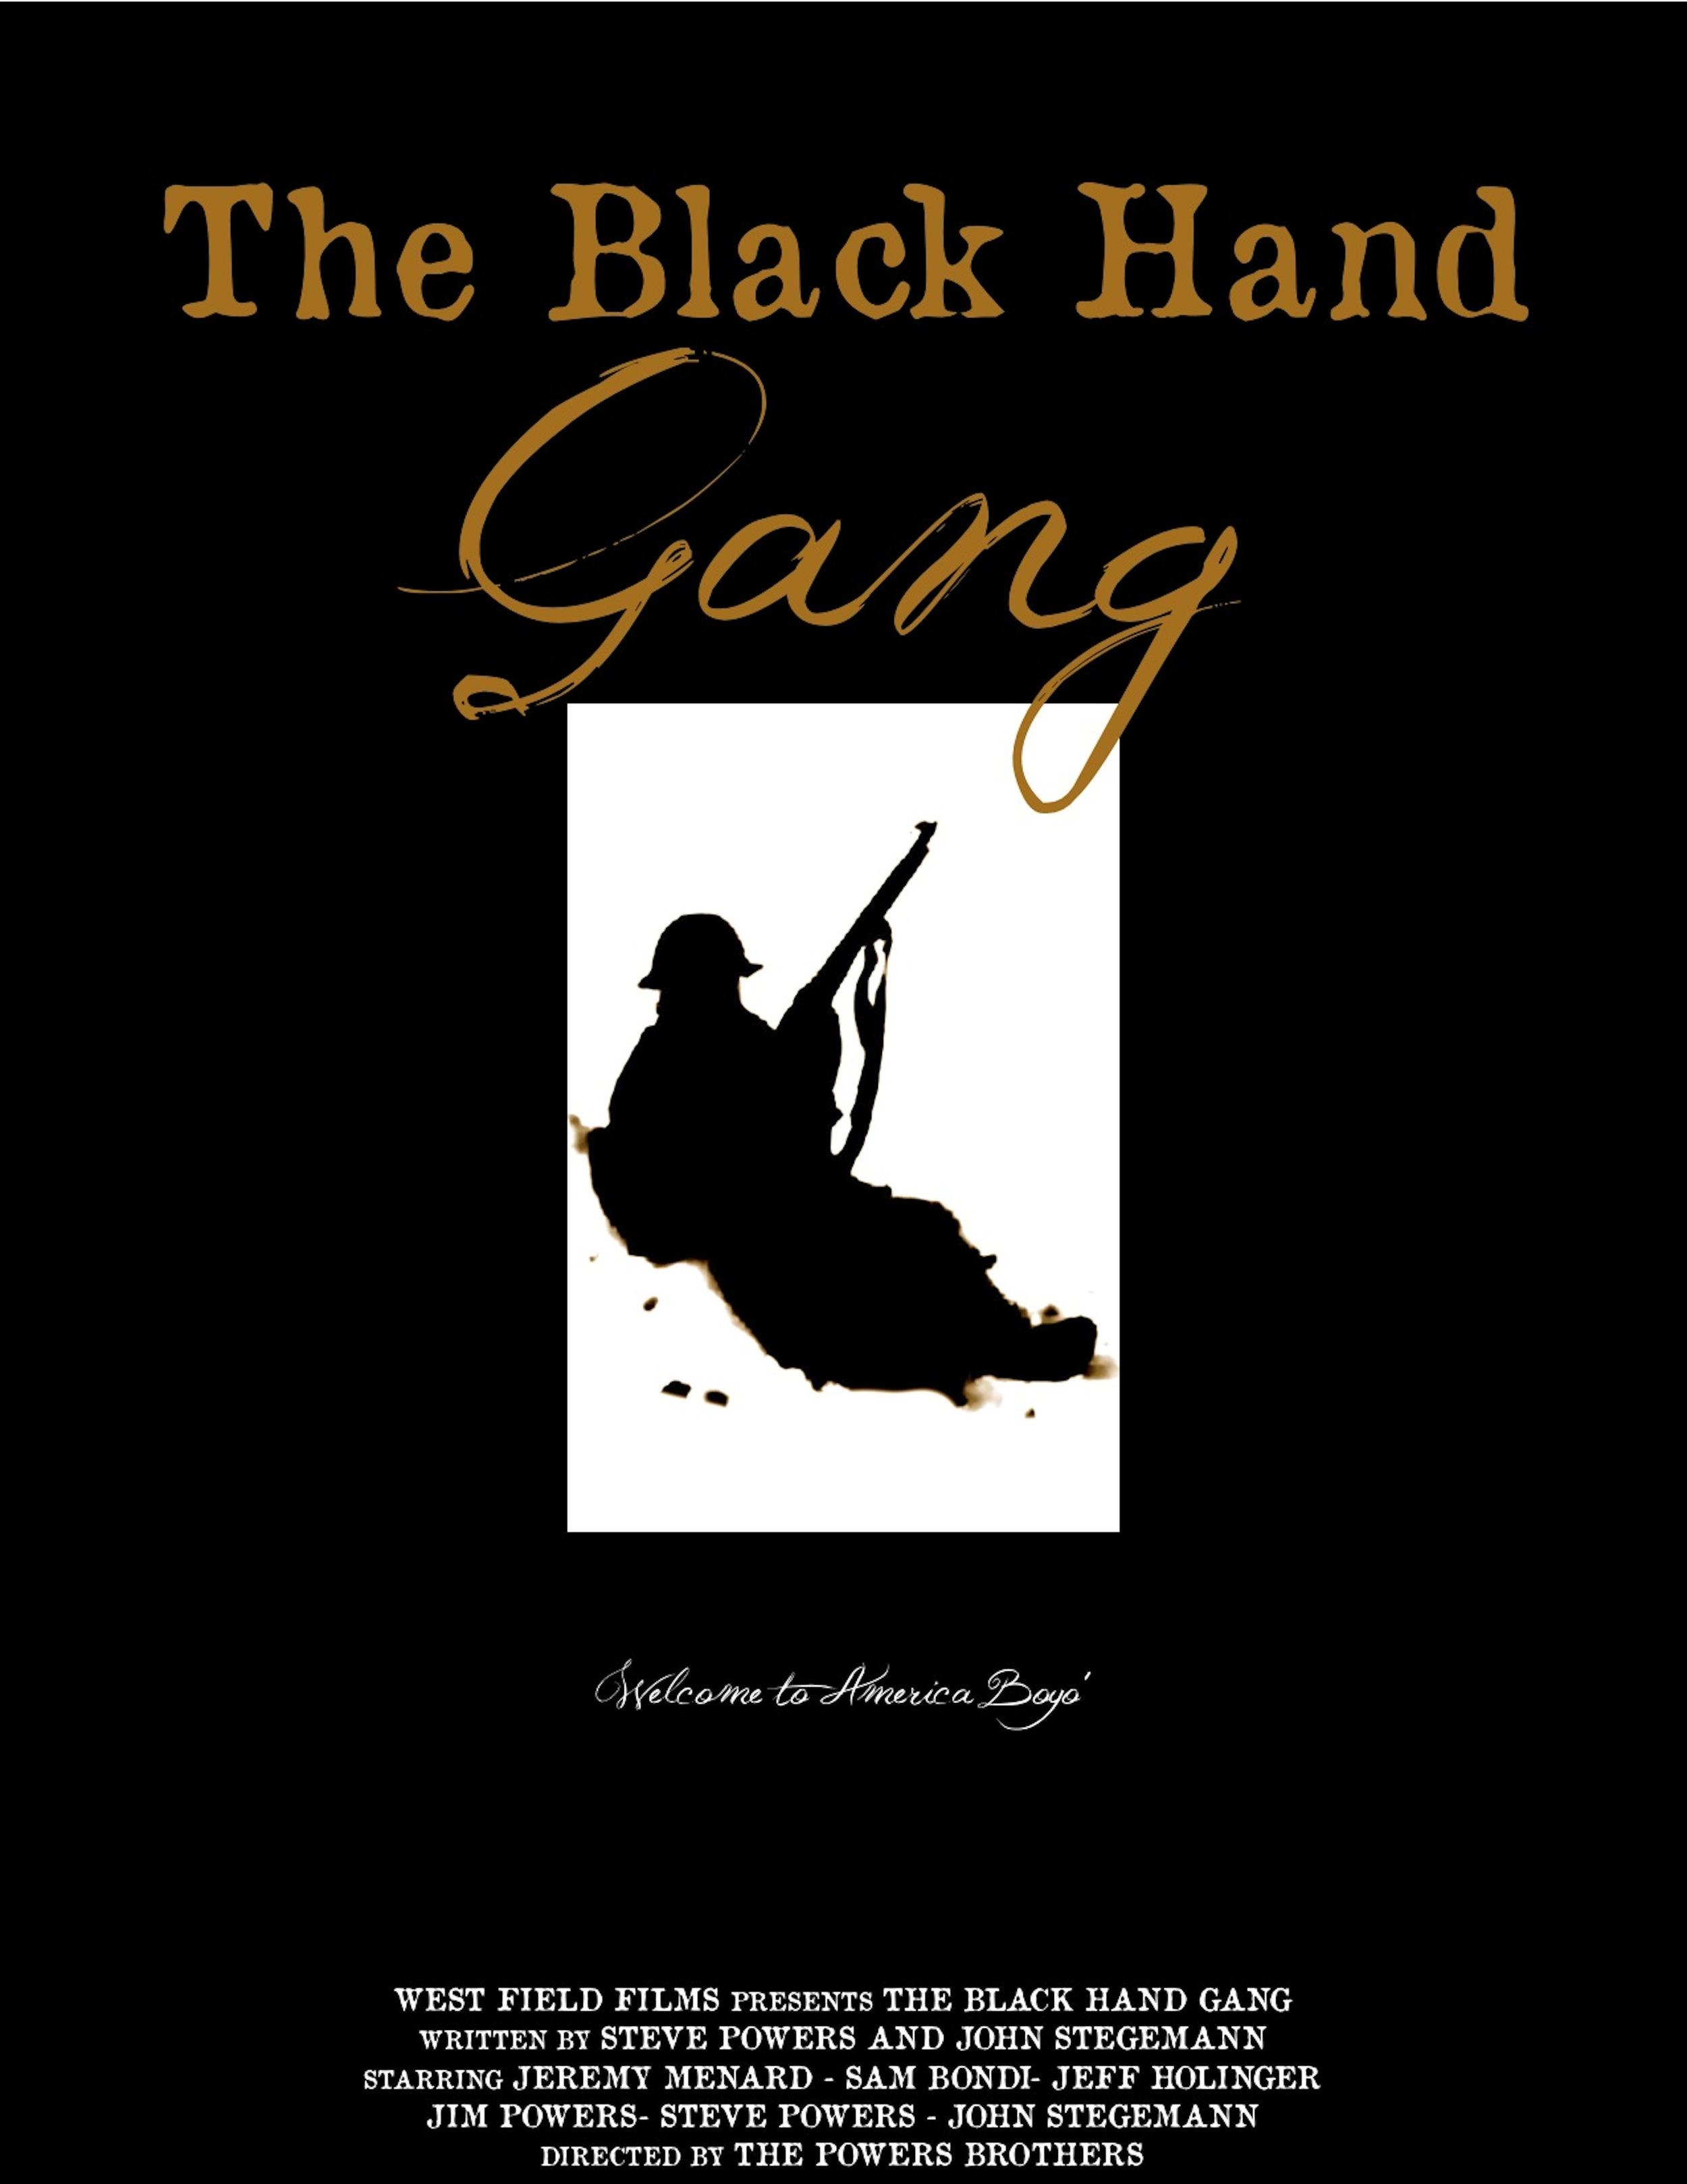 The Black Hand Gang